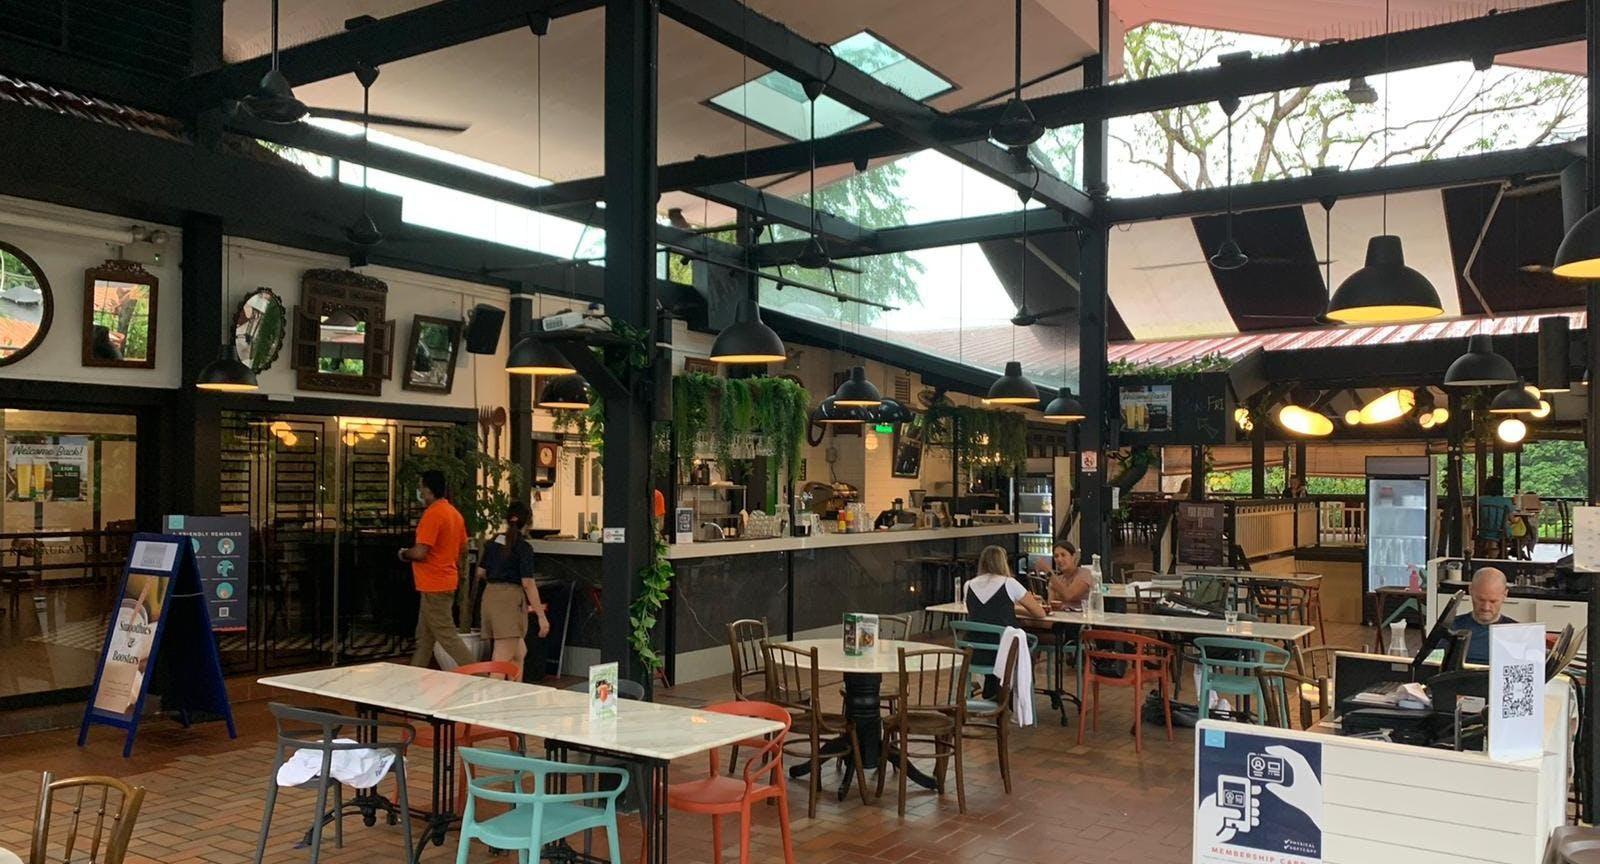 Camden Hill Restaurant & Bar